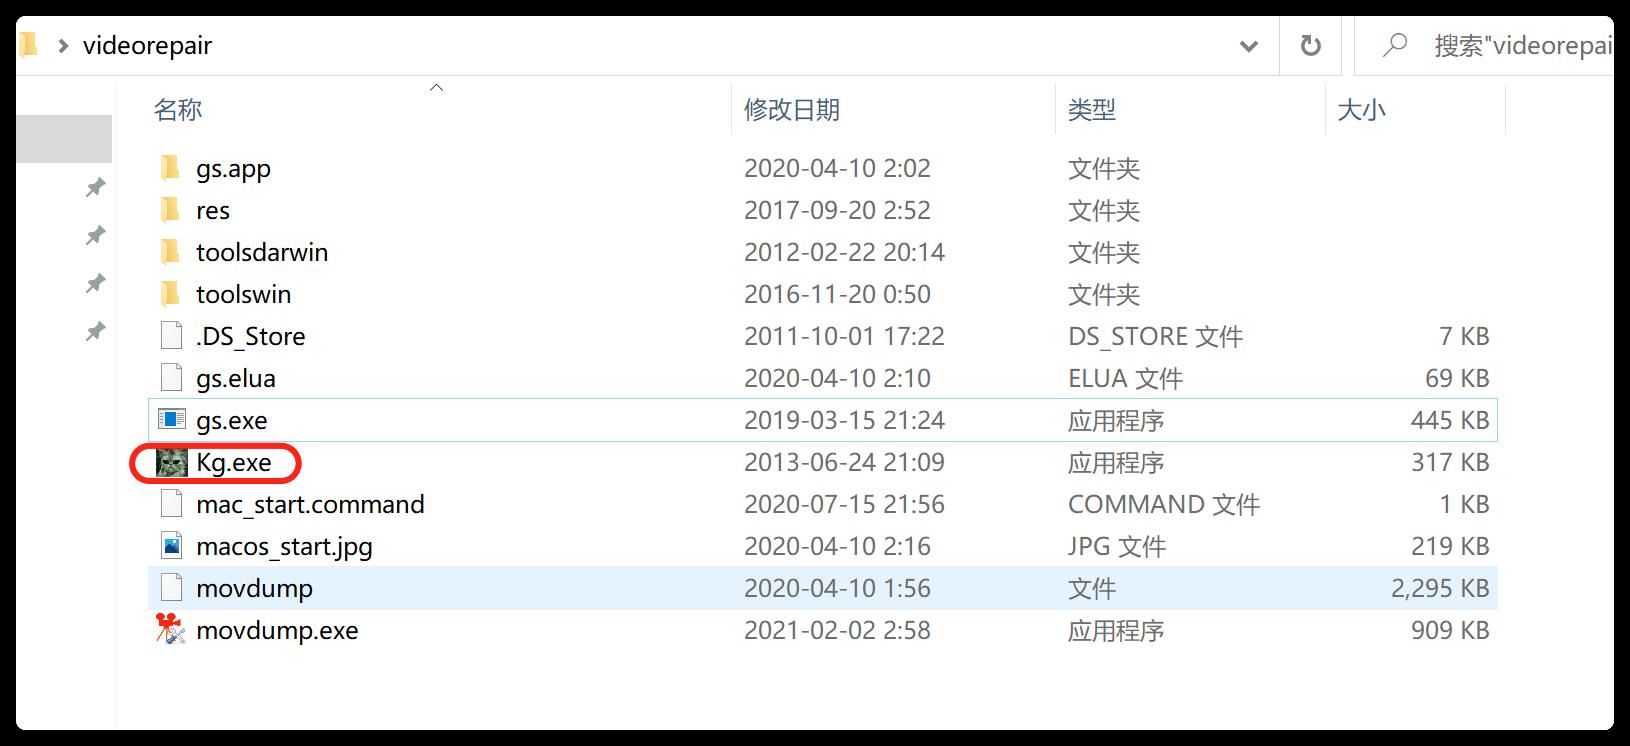 MP4视频文件损坏,可以修复!请看软件Video Repair 4.0.0!插图6